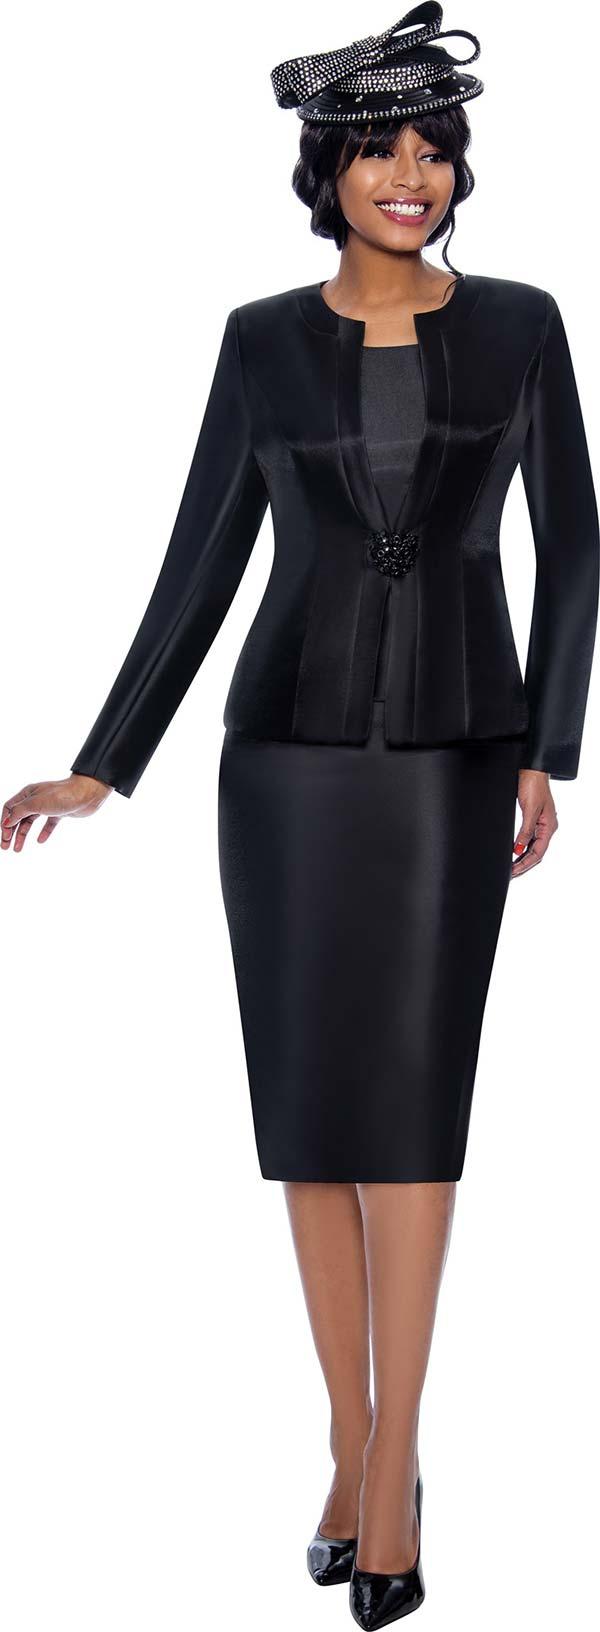 Terramina 7874-Black - Classic Style Womens Three Piece Church Suit With Rhinestone Clasp